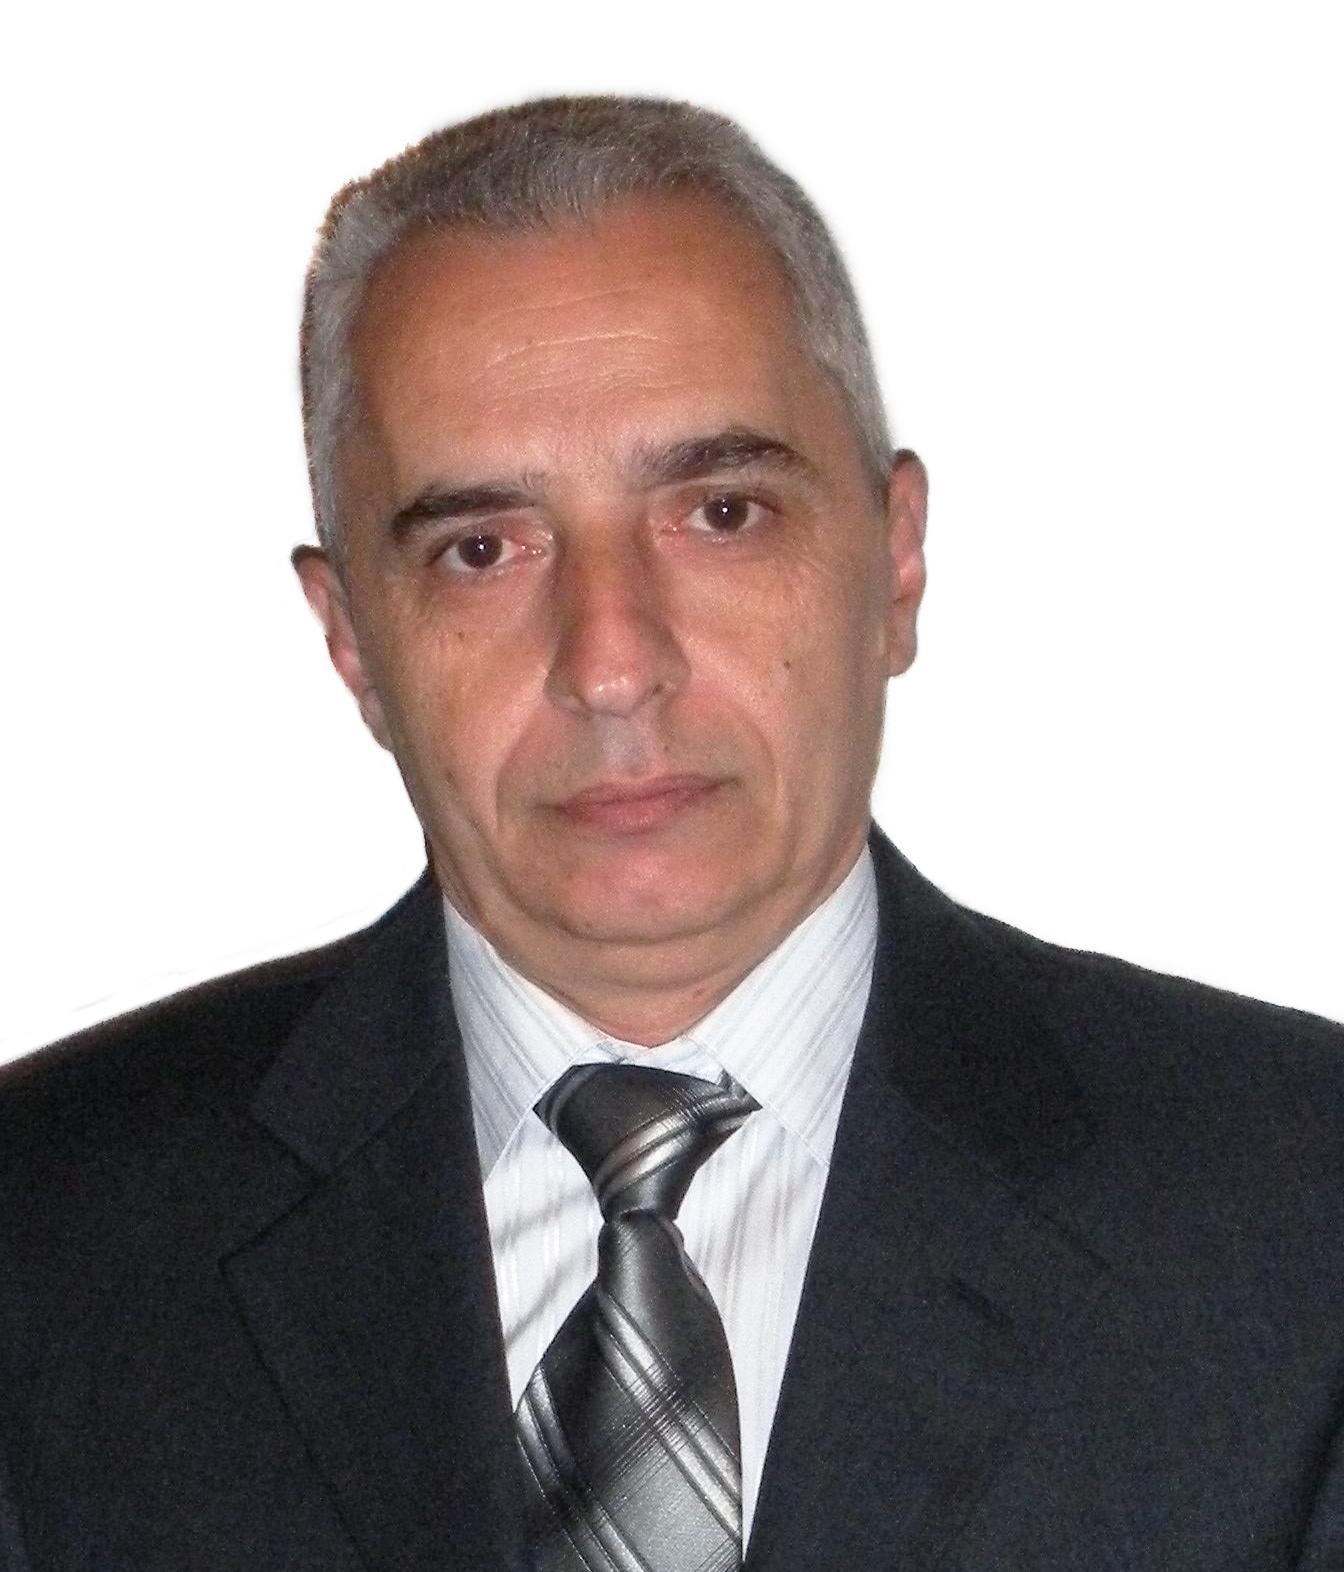 Vardan Andriasyan